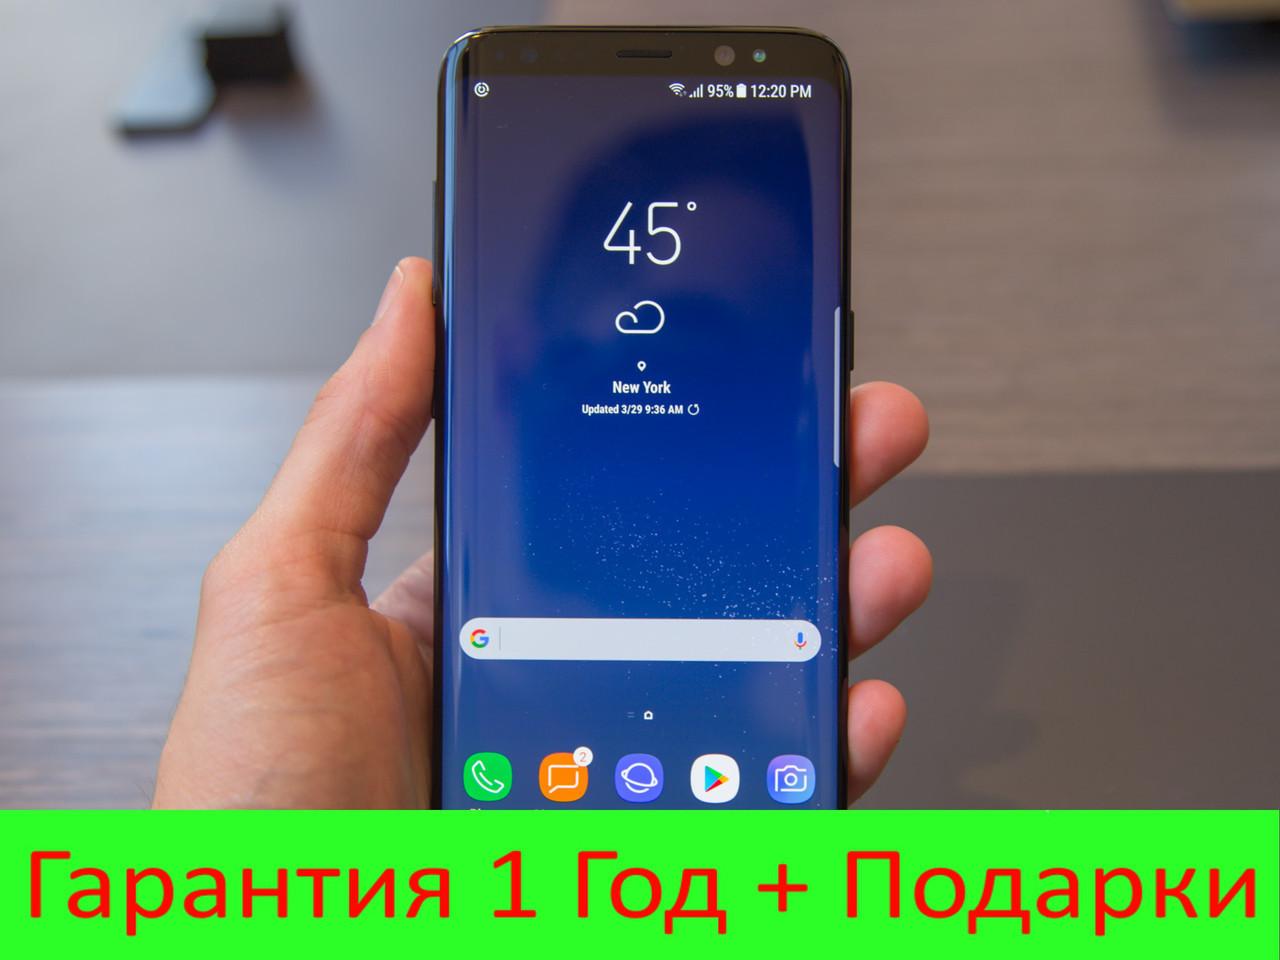 Появились в продаже корейские Samsung Galaxy S9 на 64GB s5/s8 копия